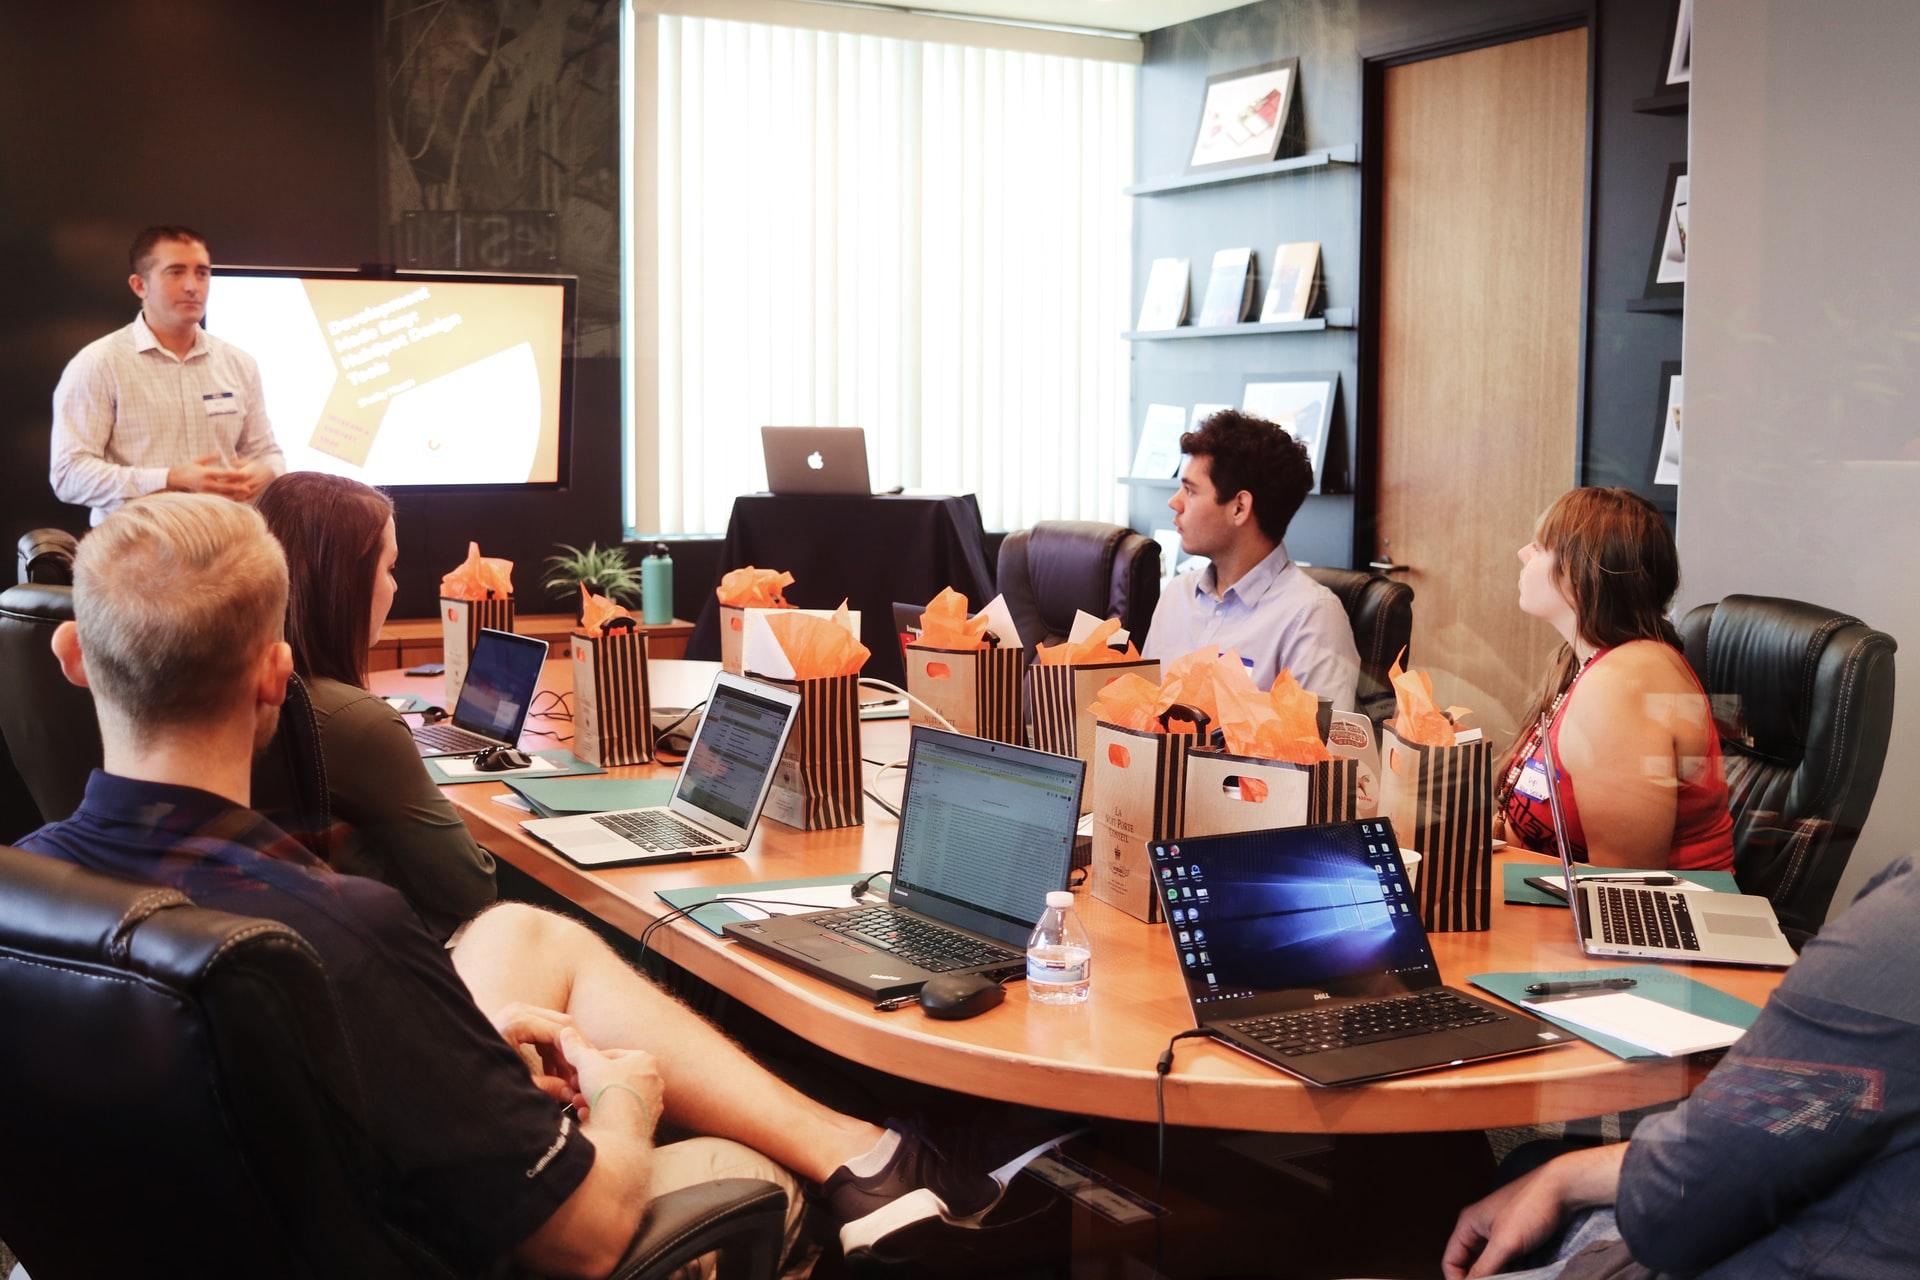 pragmatic business planning